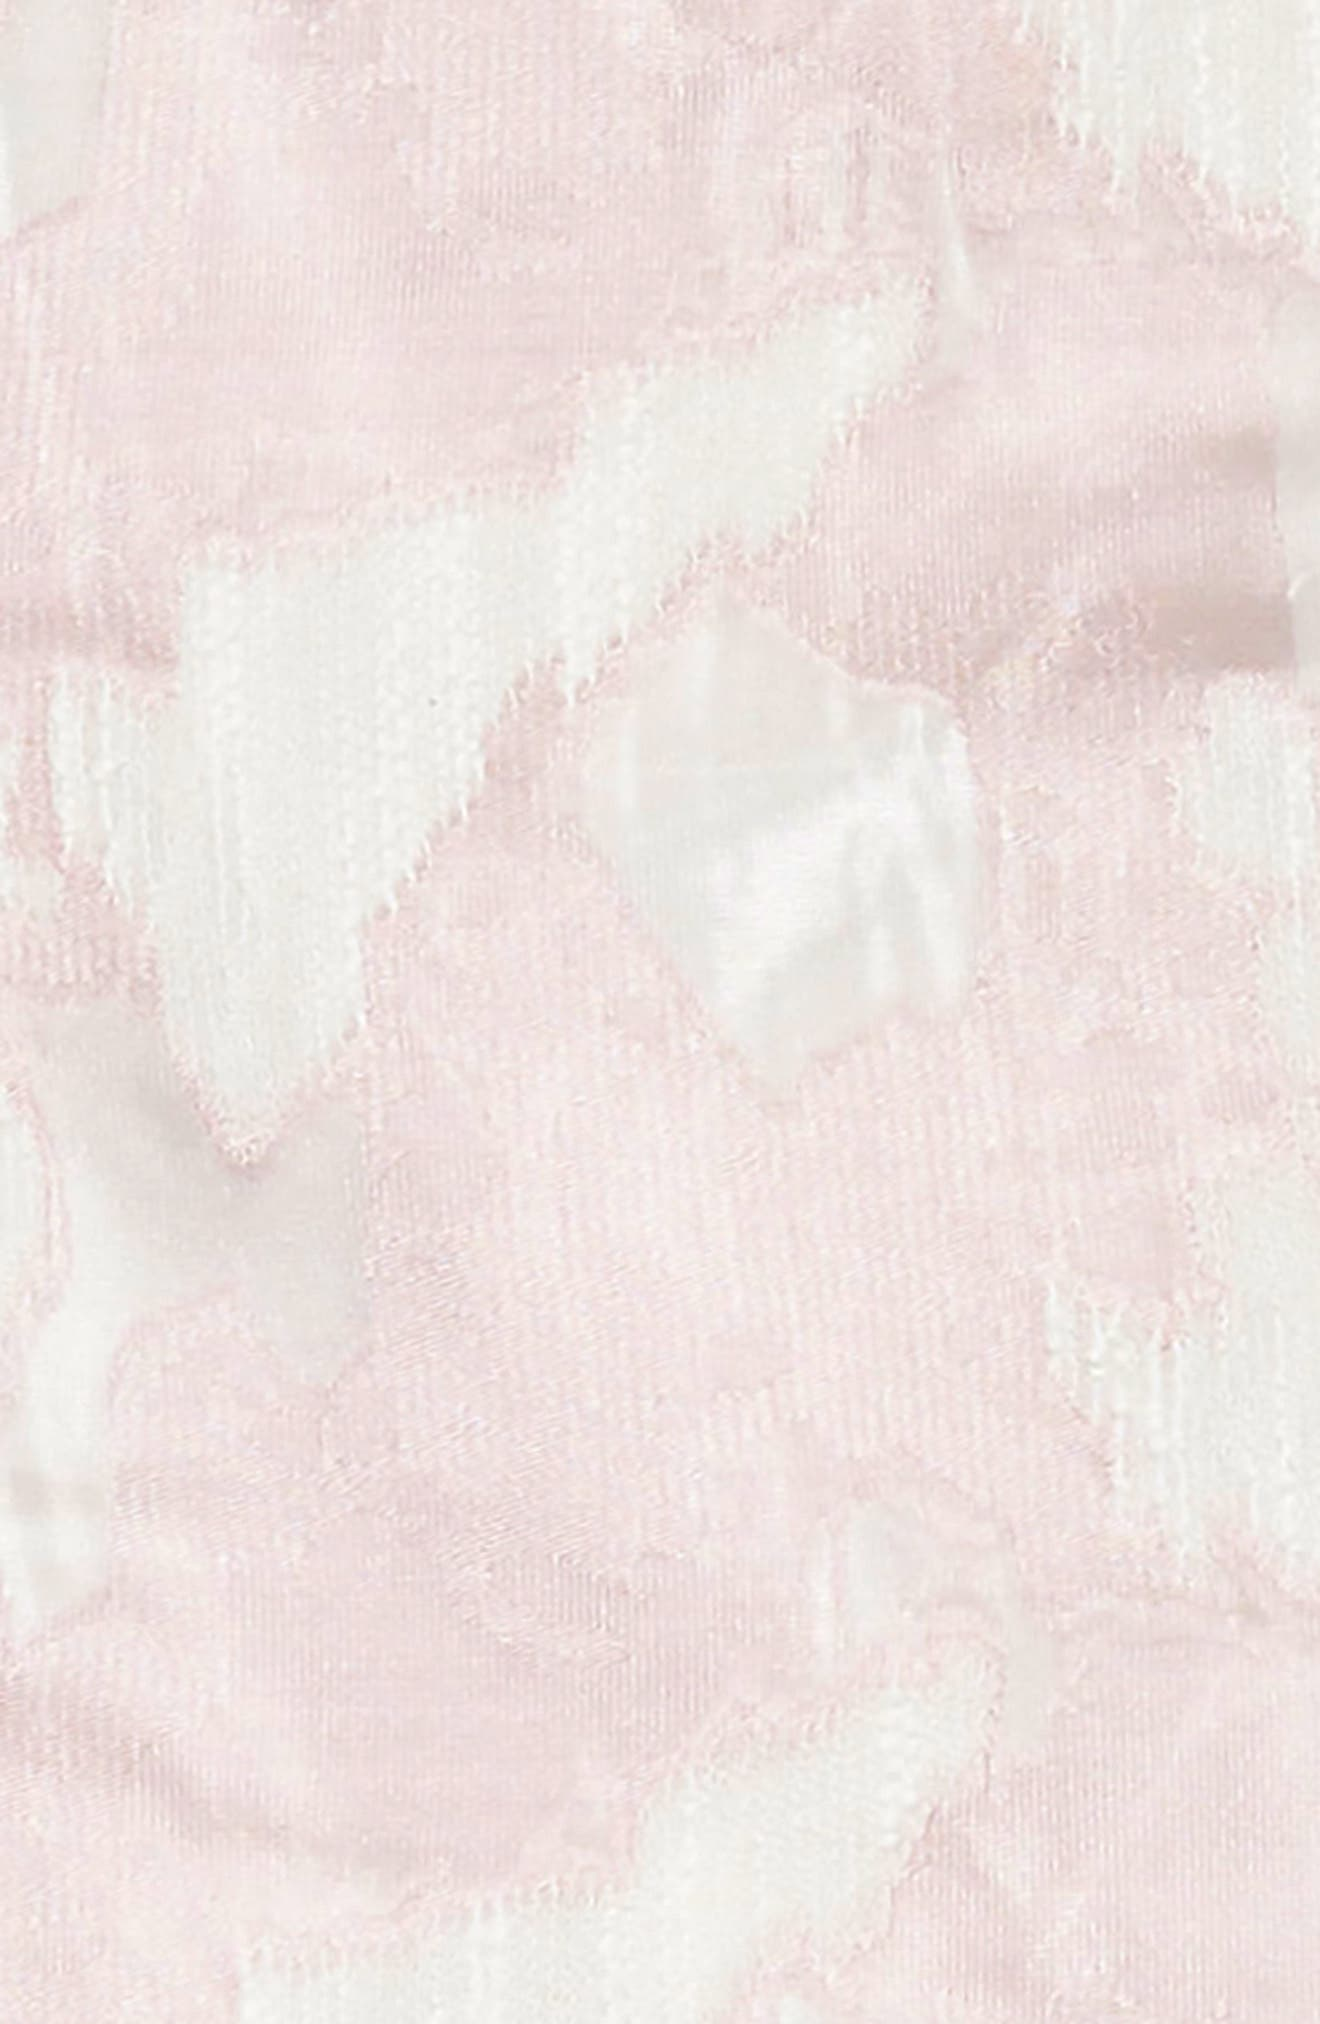 Chiffon Party Dress,                             Alternate thumbnail 3, color,                             Pink/ White